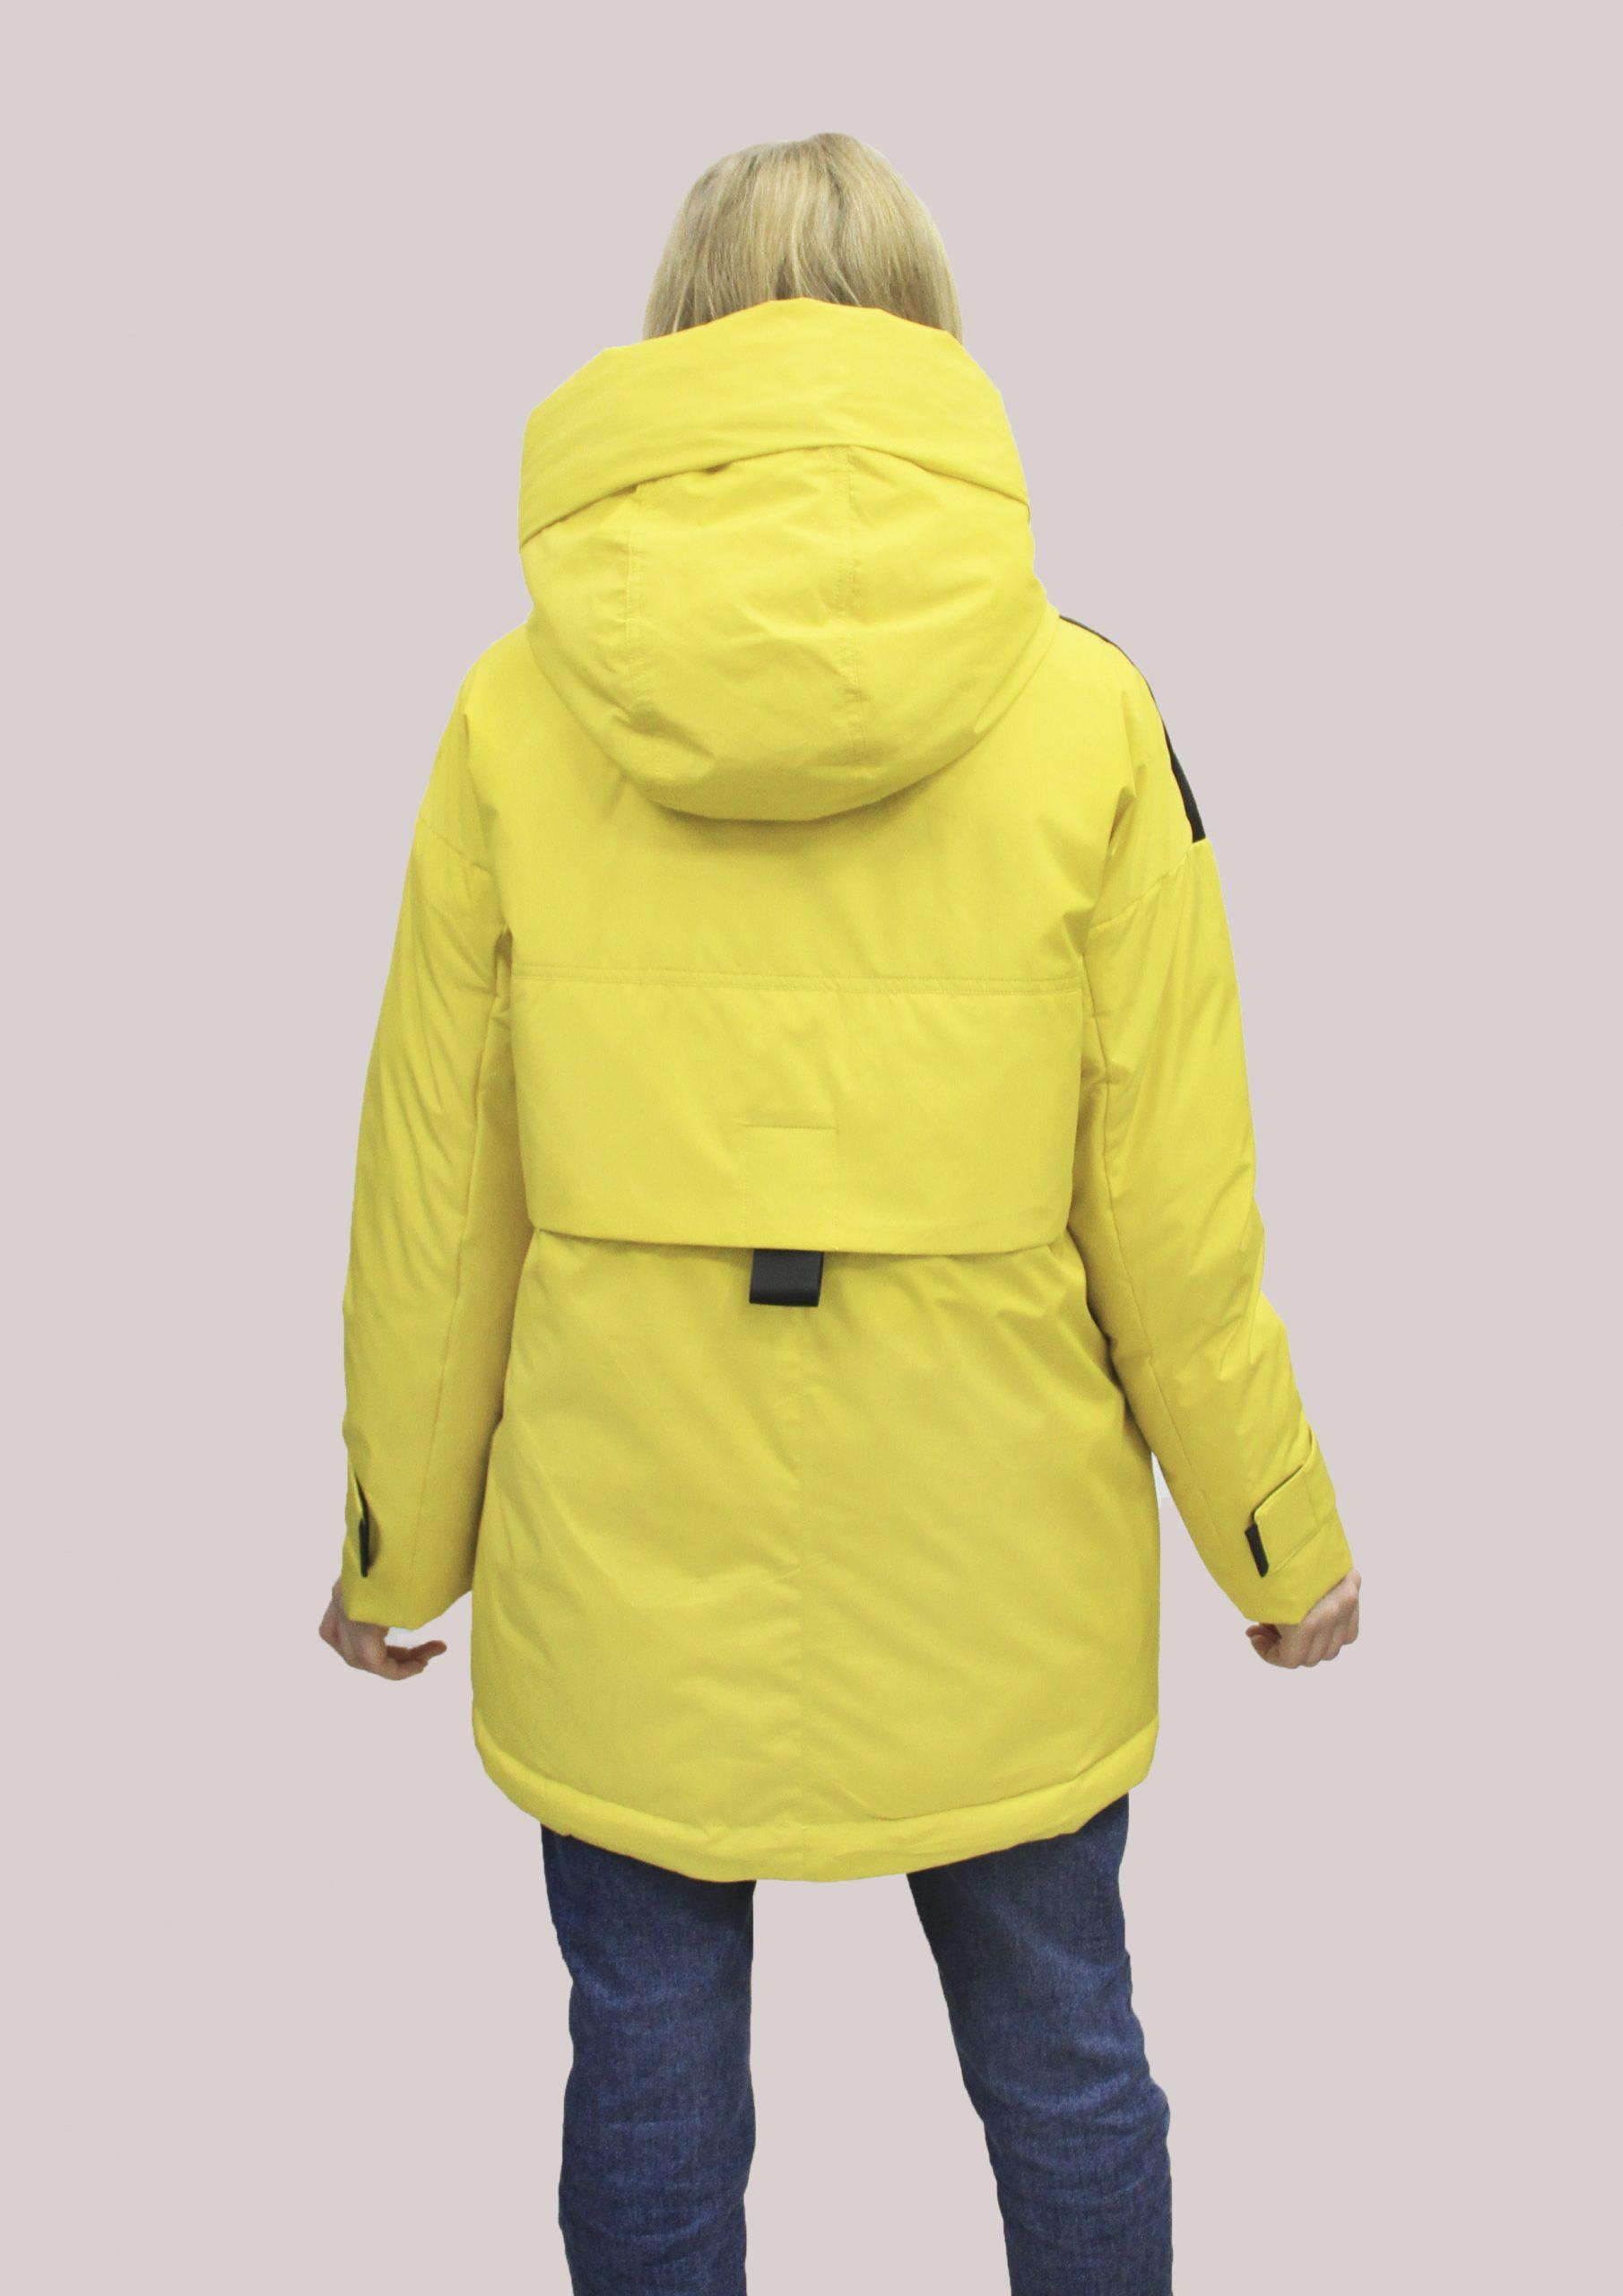 Женская зимняя куртка (Vteple 9201))